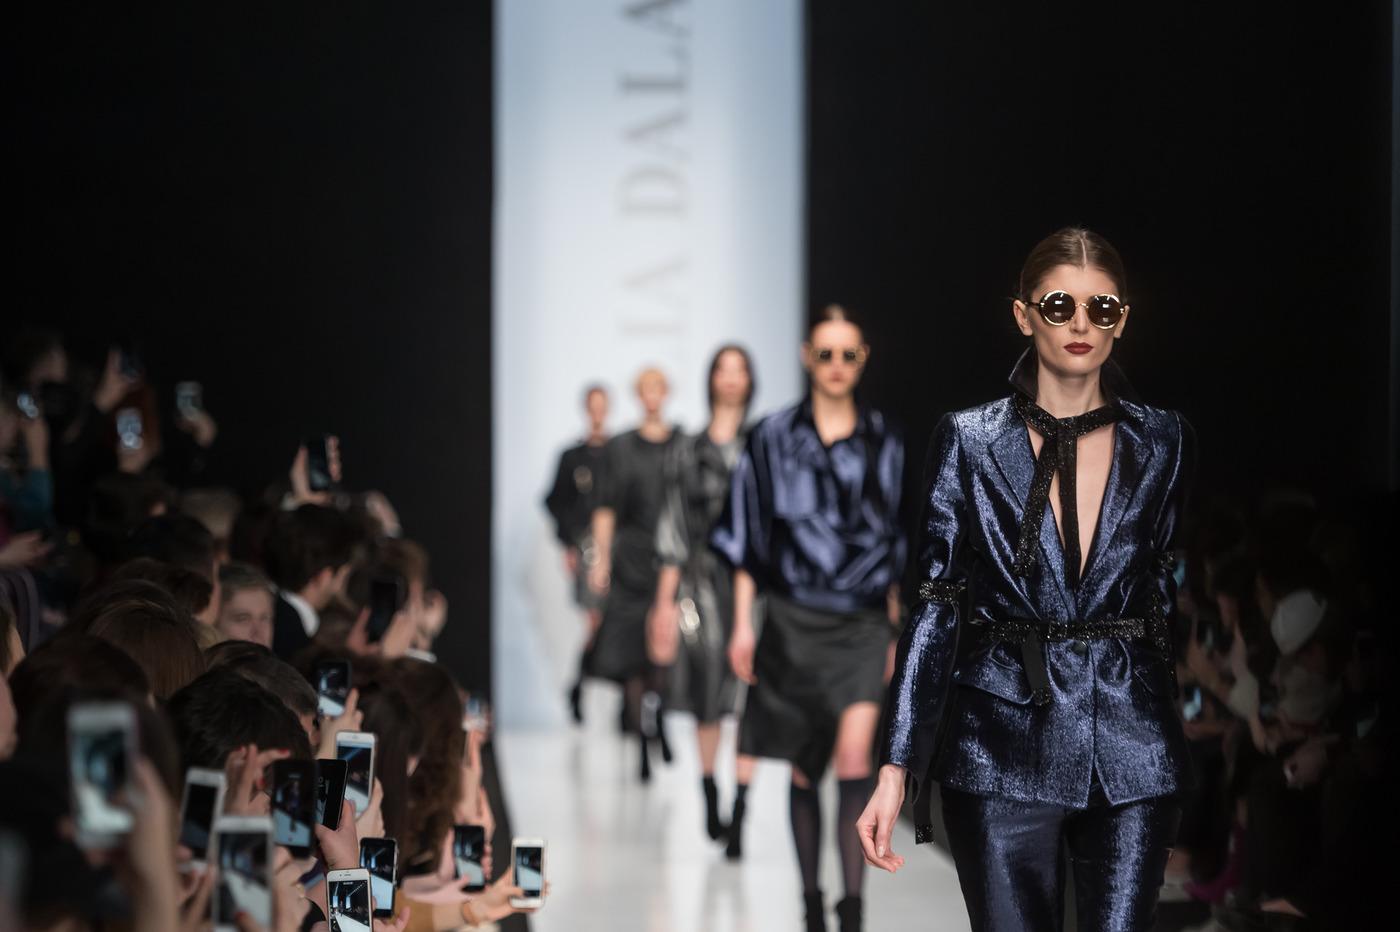 Весенний показ Мерседес Бенс Fashion Week Russia благополучно прошел в столице России